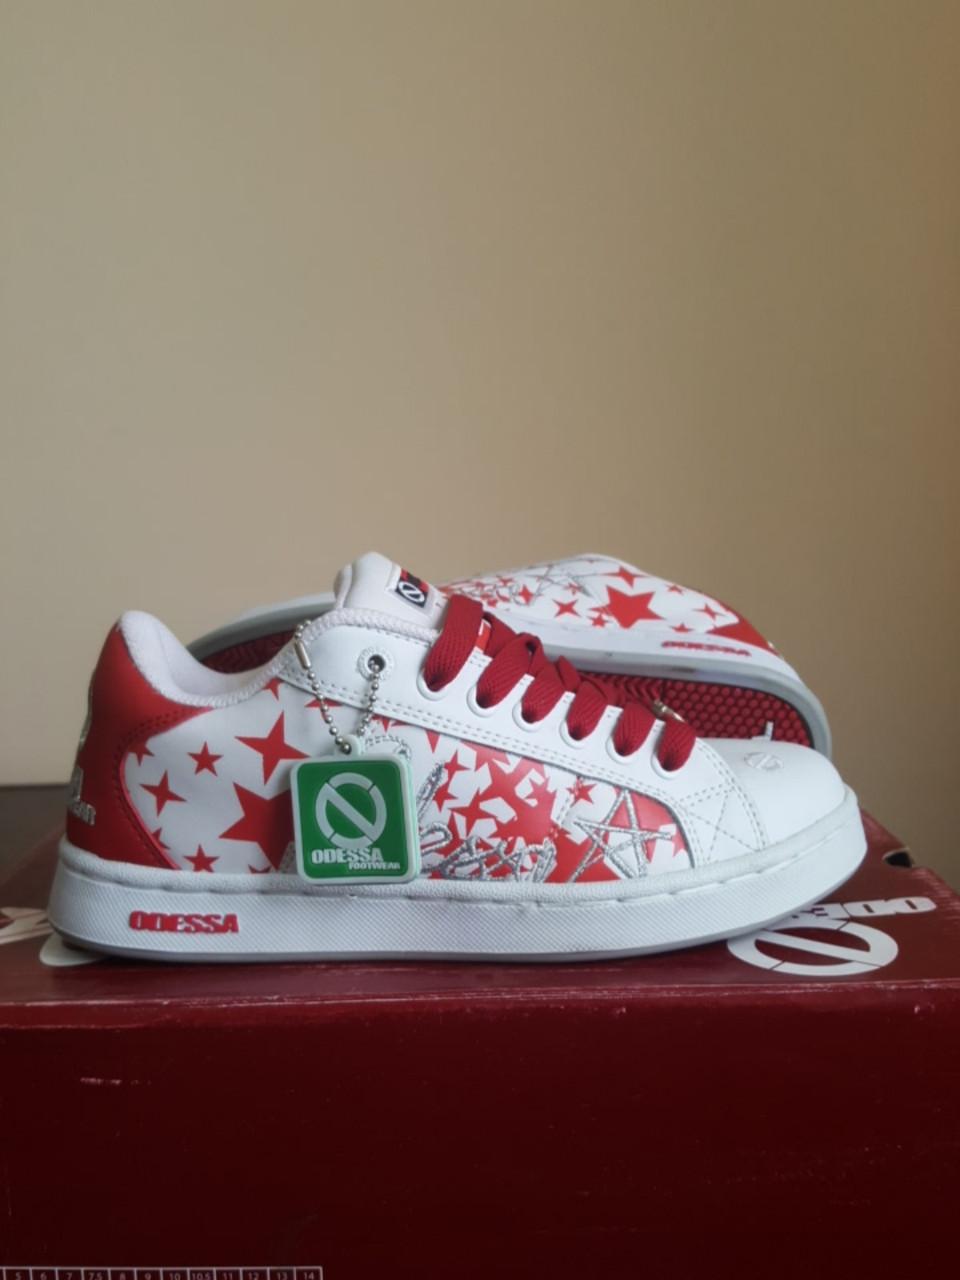 Кросівки Odessa Baker Gstars wht/red/sil розмір 37 (23 см)